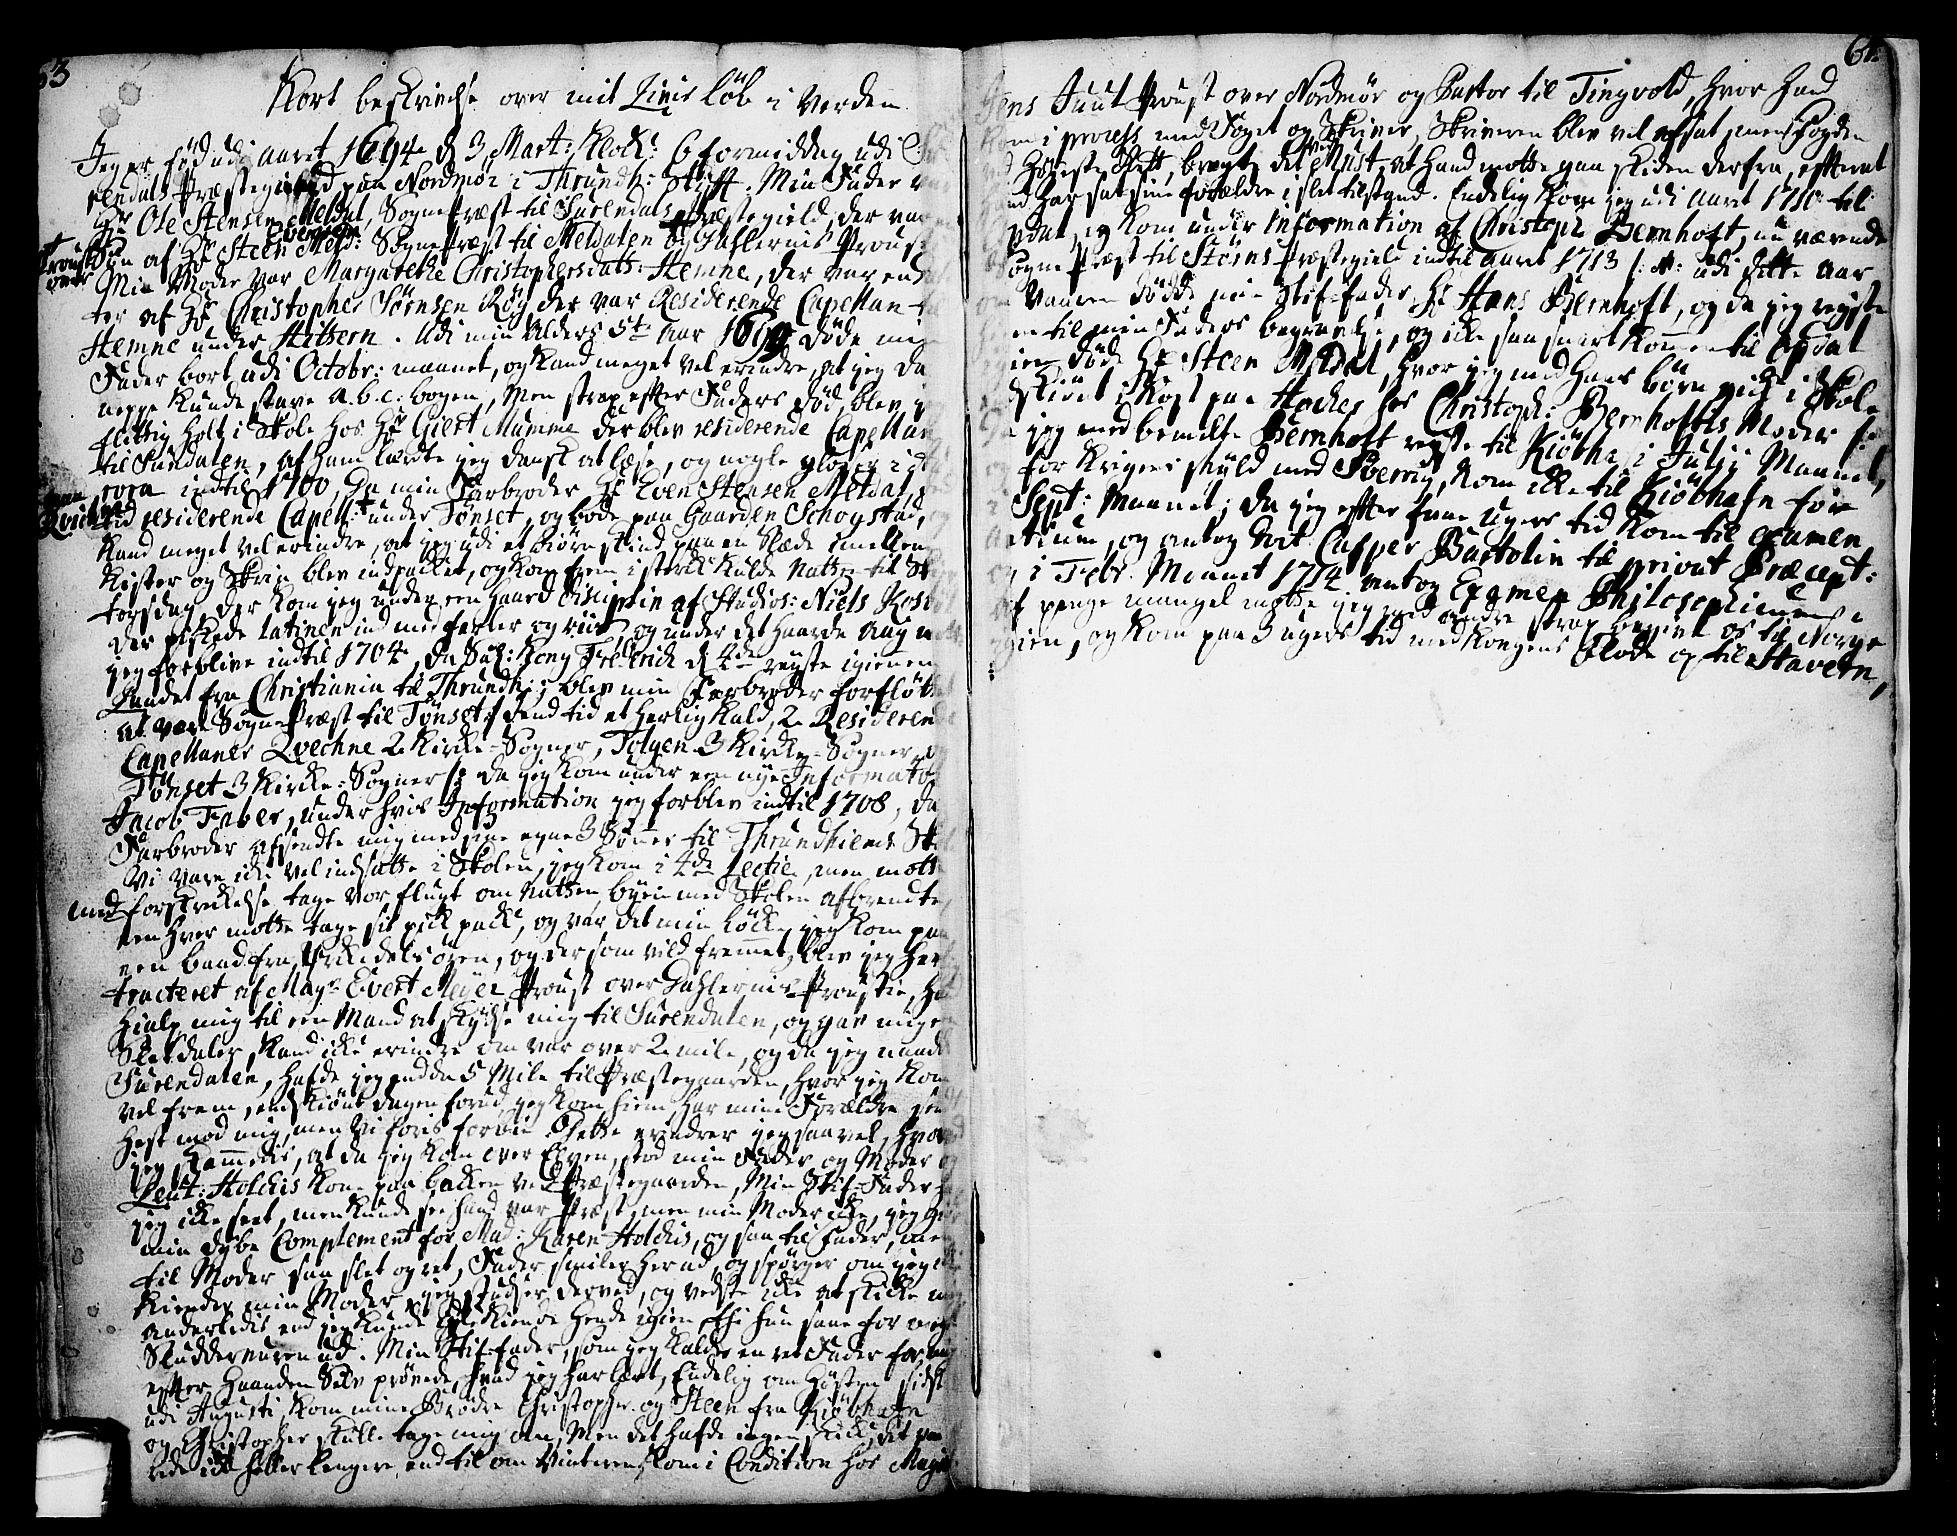 SAKO, Drangedal kirkebøker, F/Fa/L0002: Ministerialbok nr. 2, 1733-1753, s. 63-64